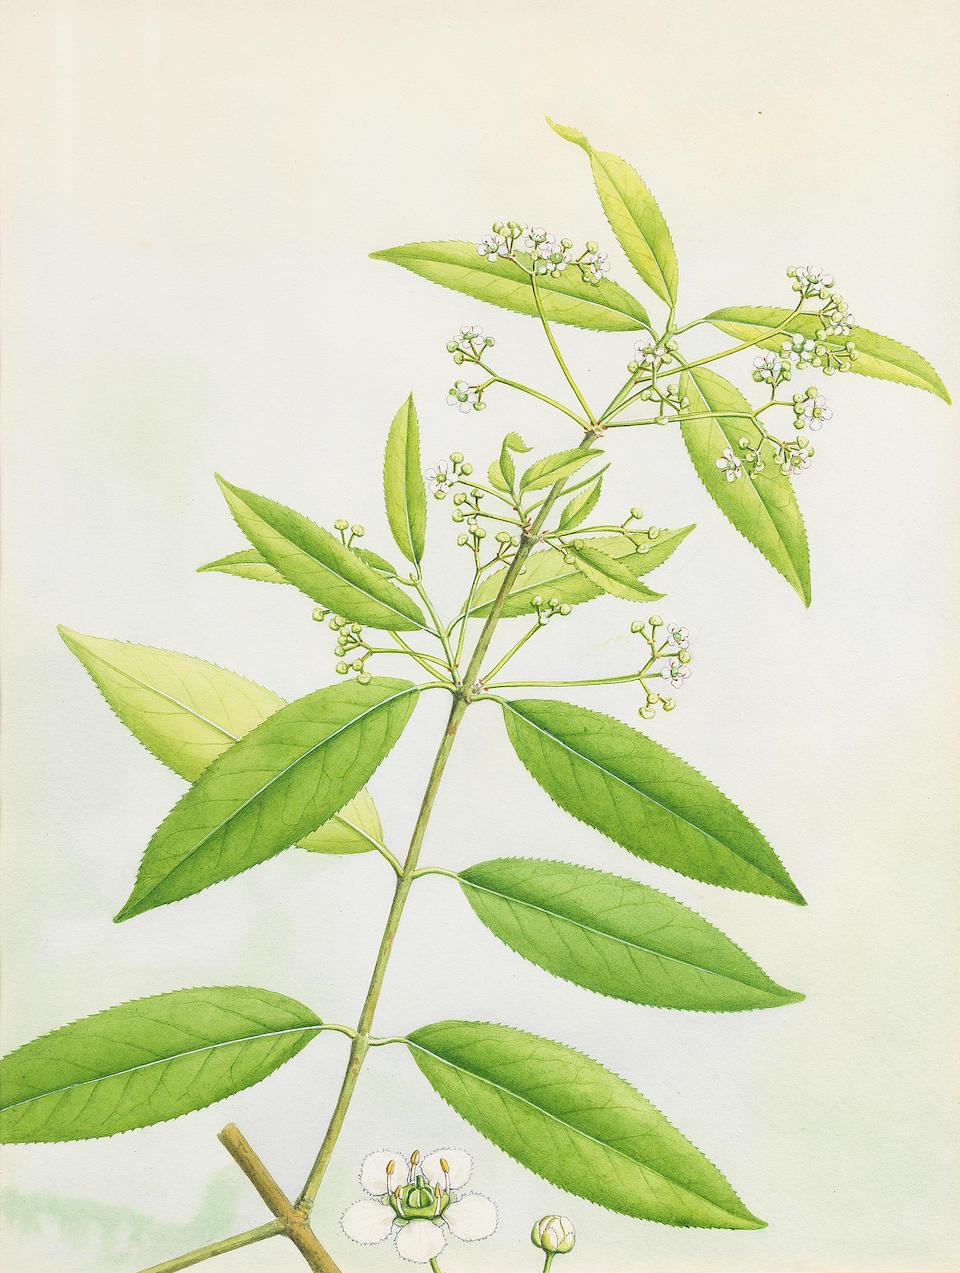 Twelve watercolour studies of flowering plants, by Thakur Ganga Singh (1895-1971), court painter to Yadhavindra Singh, Maharajah of Patiala (reg. 1938-47) Patiala, 1940-50(12)